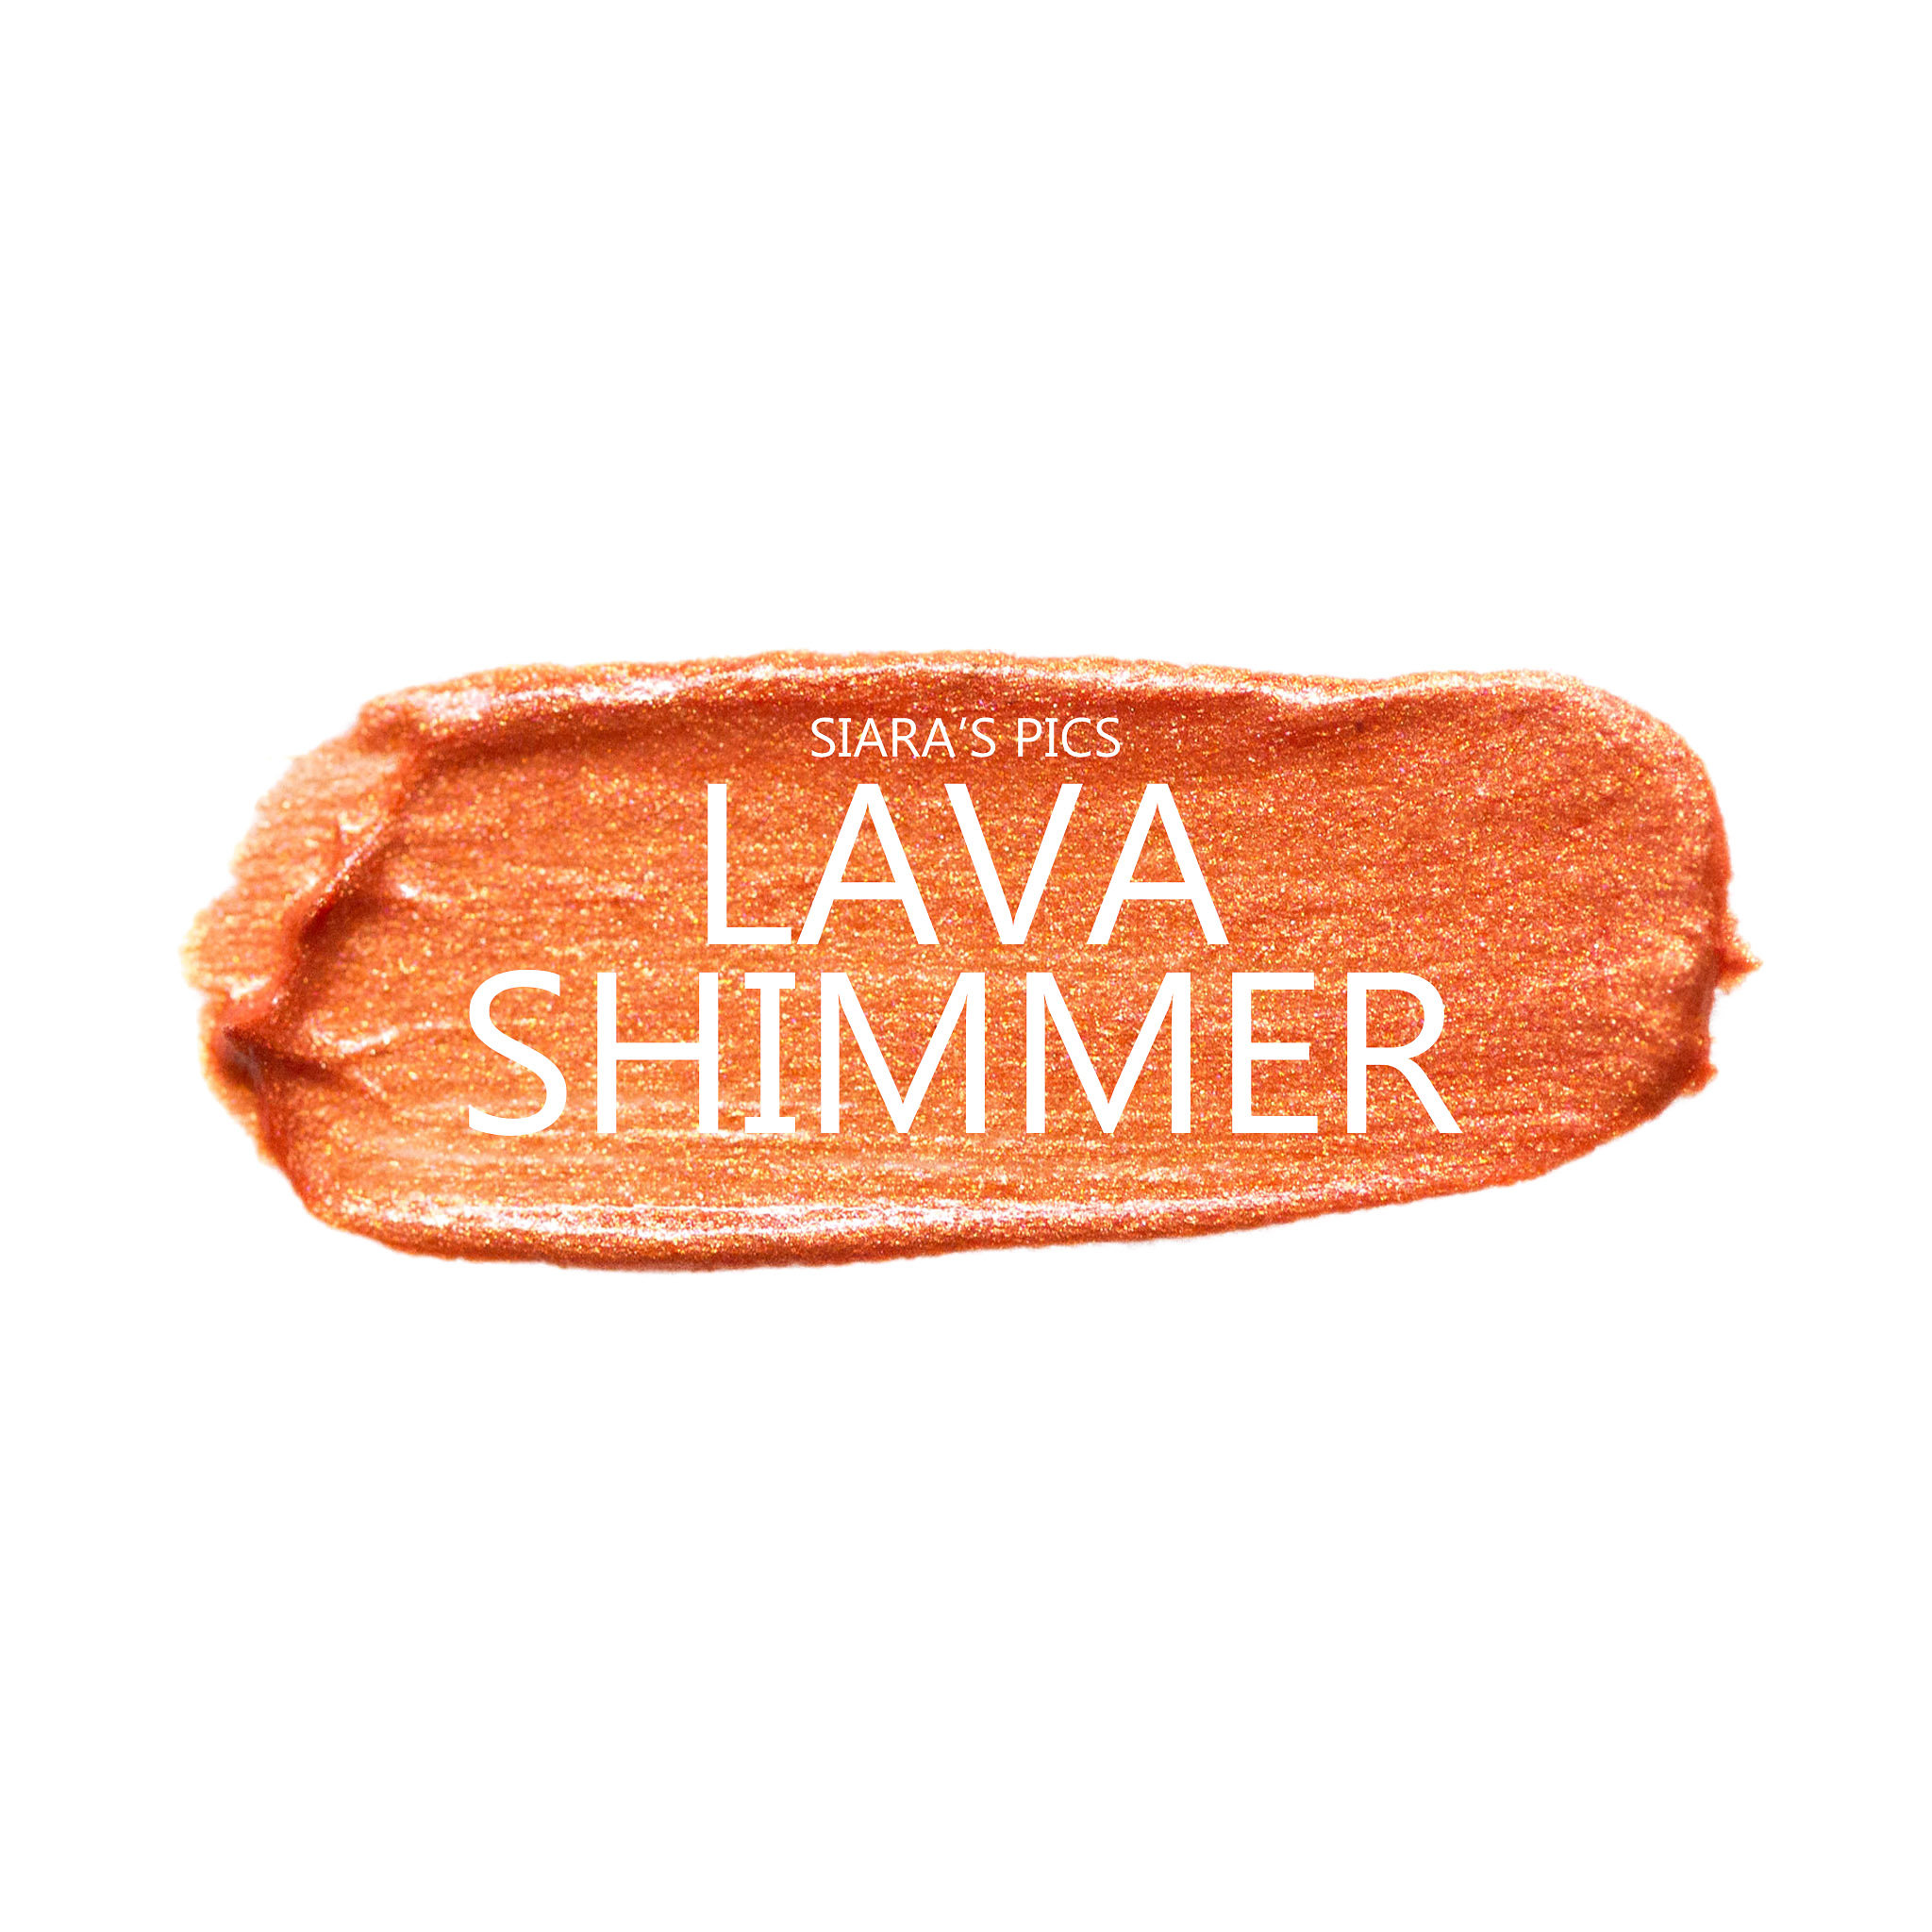 lava shimmer shadowsense.jpg